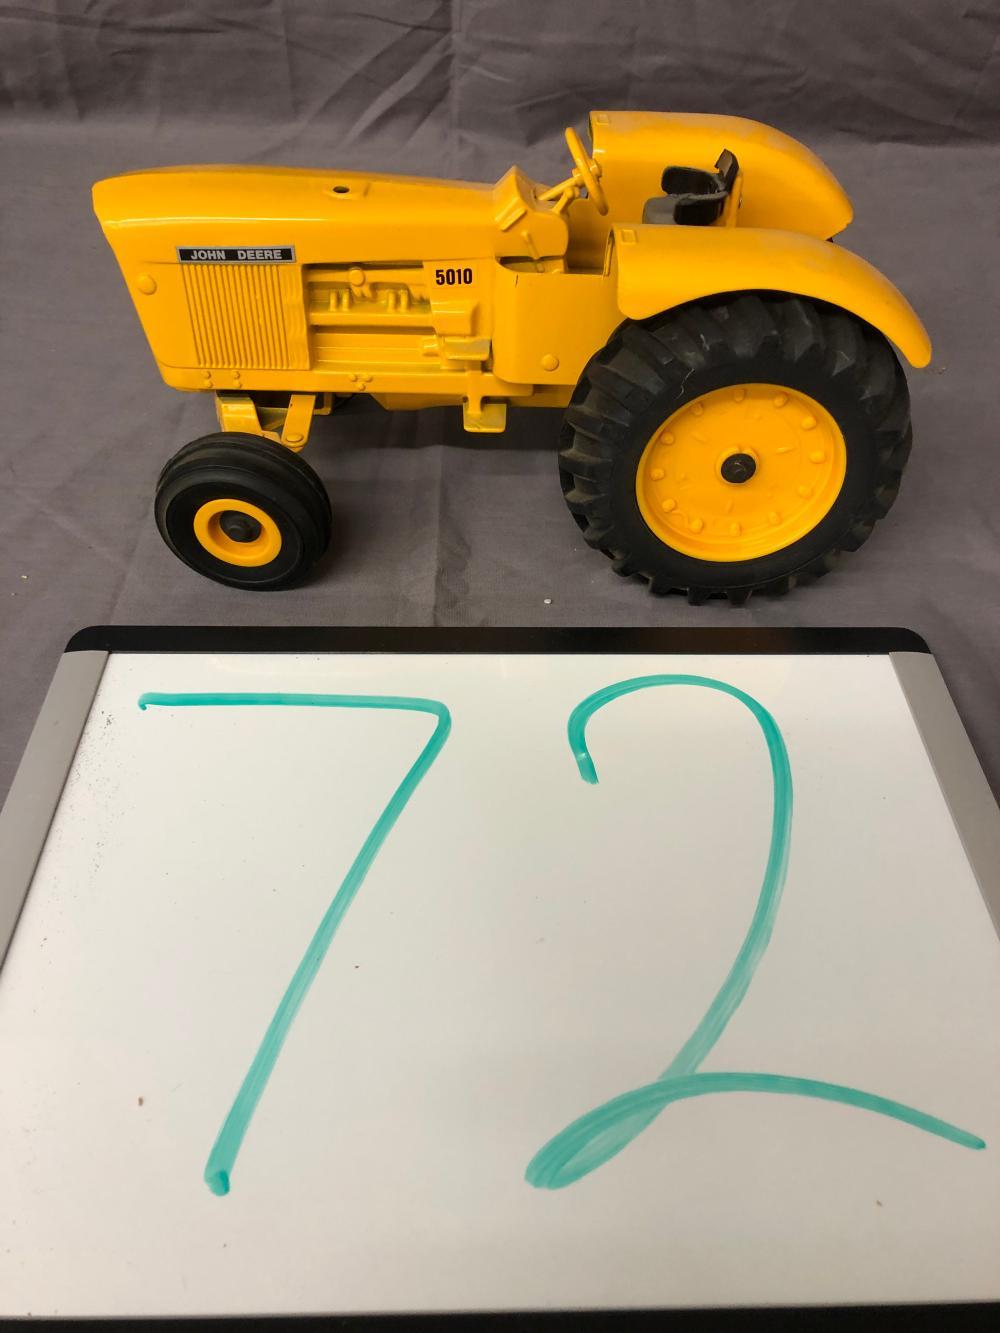 1/16th Scale John Deere 5010